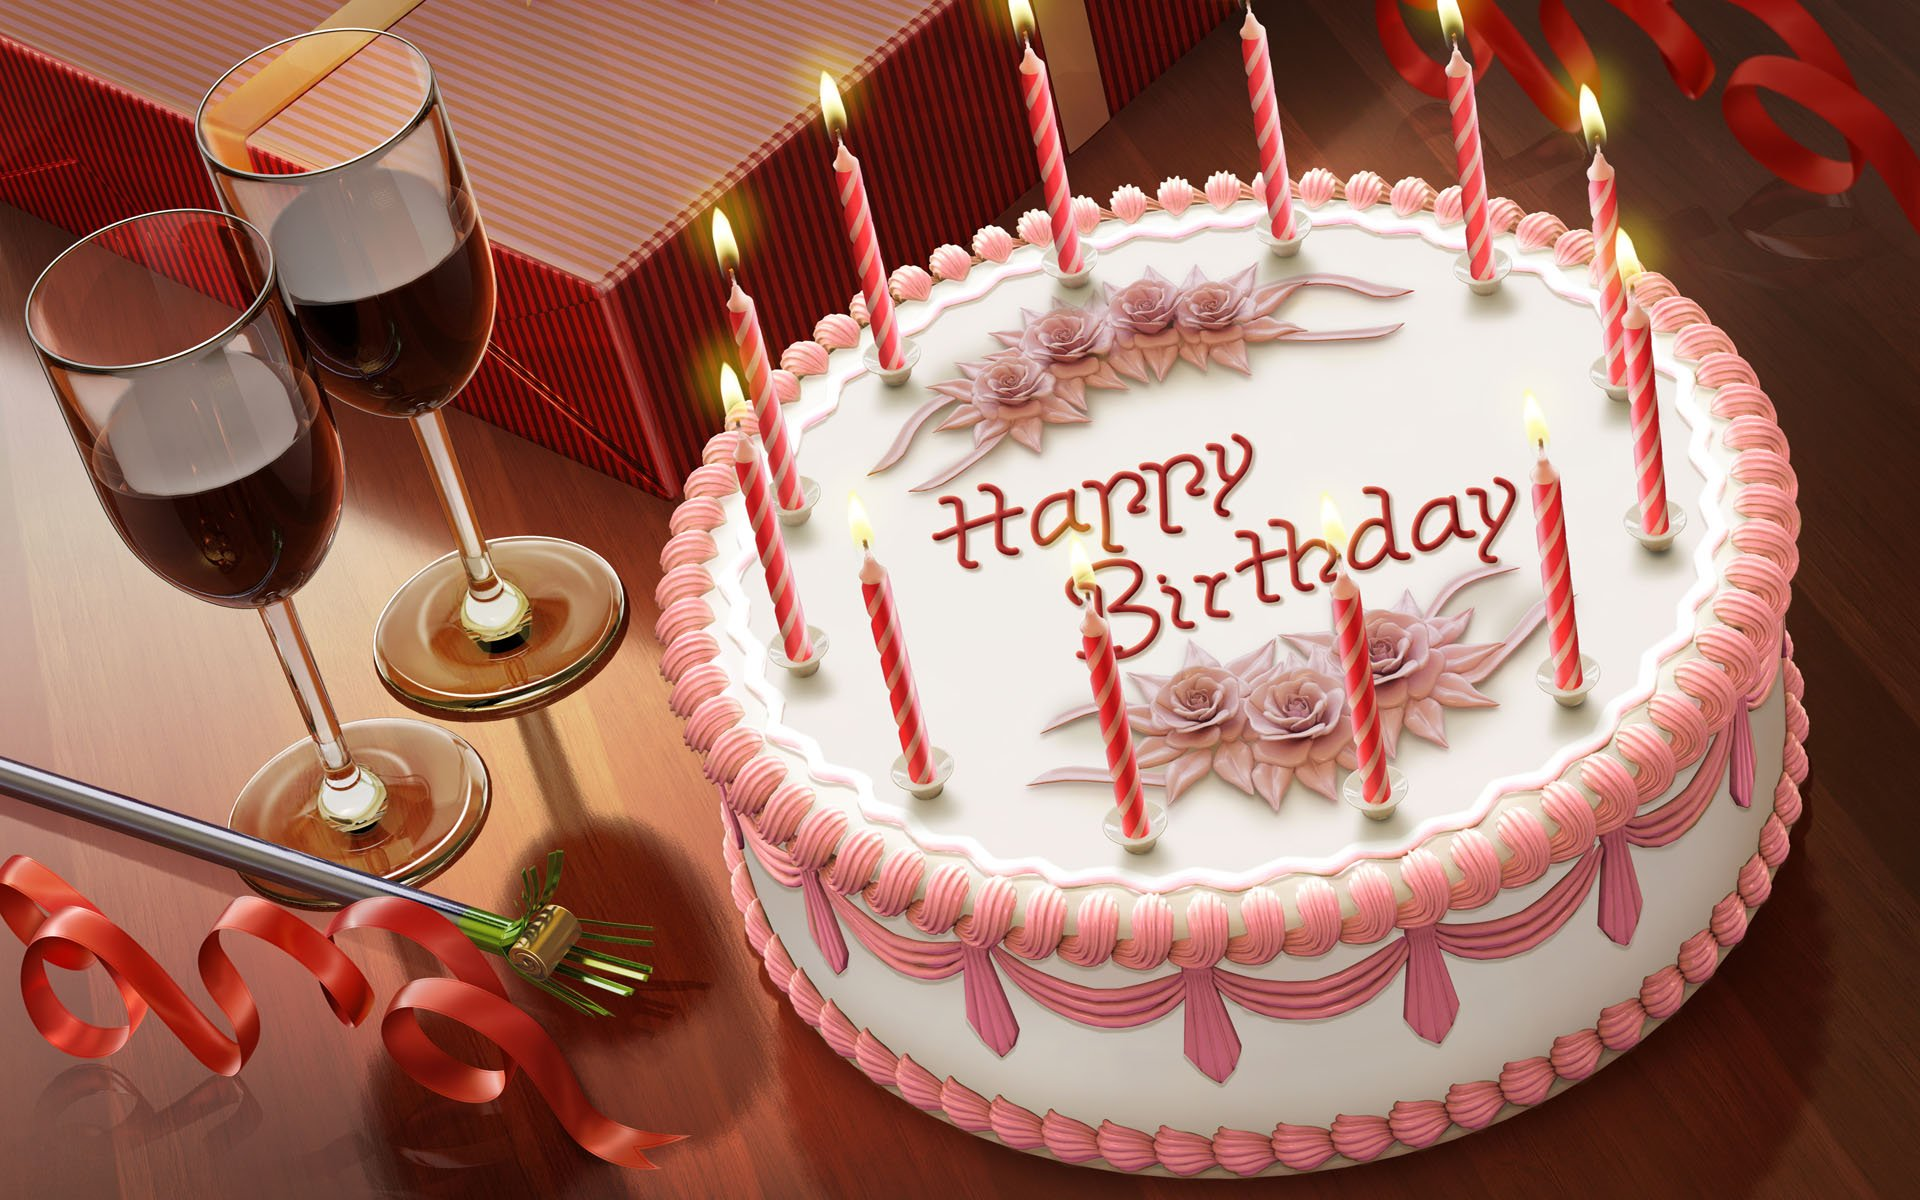 Tortas de cumpleaños - 1920x1200